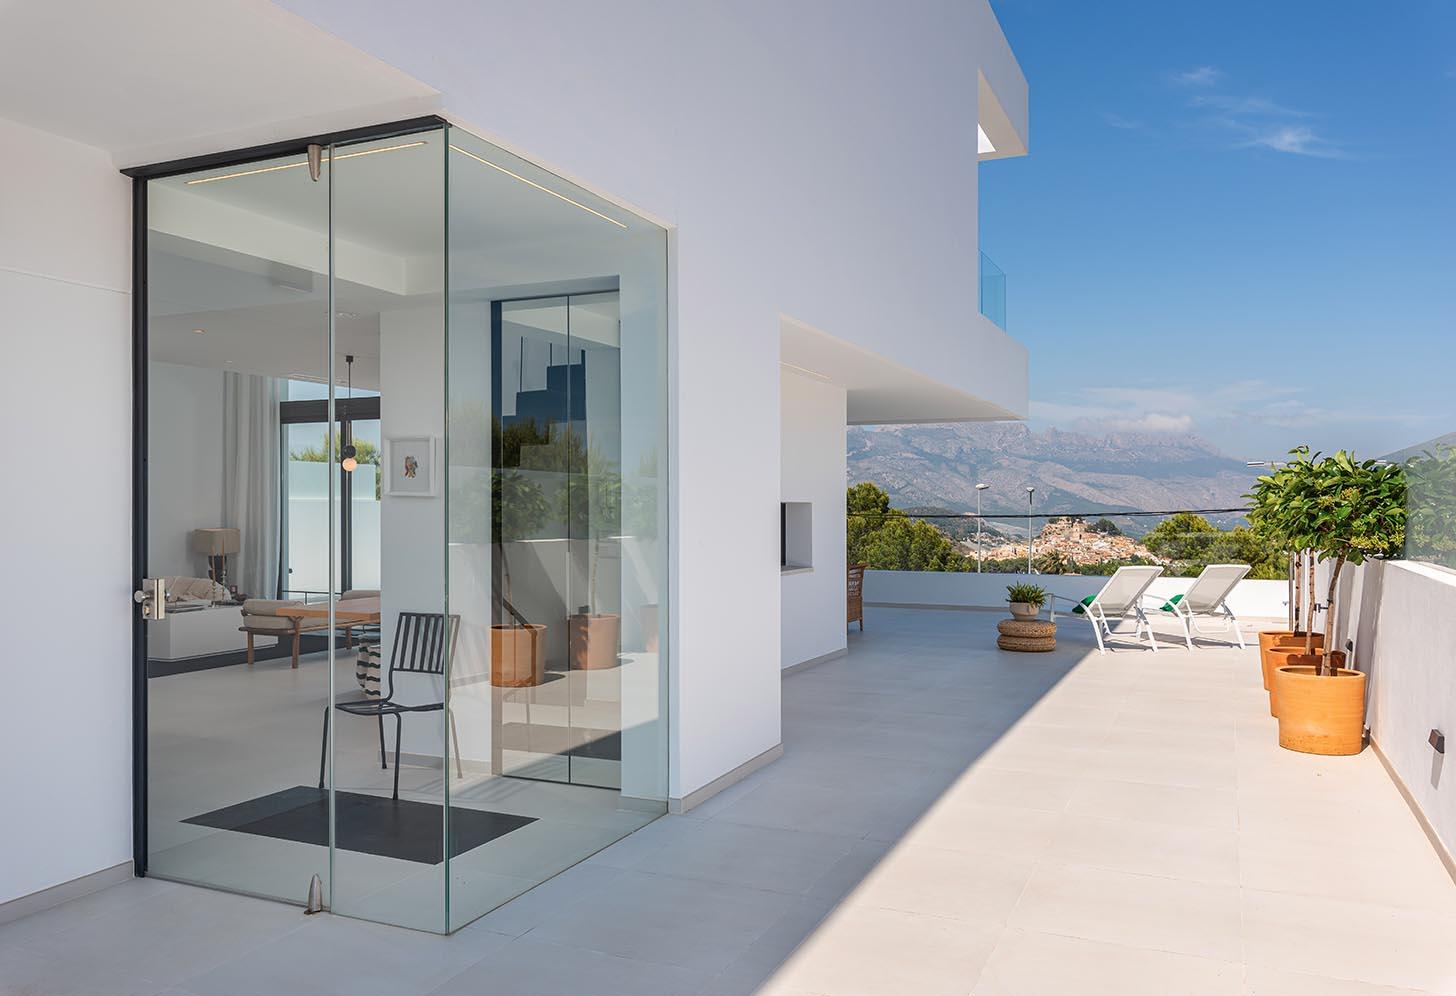 immobilier neuf espagne costa blanca alicante polop terrase